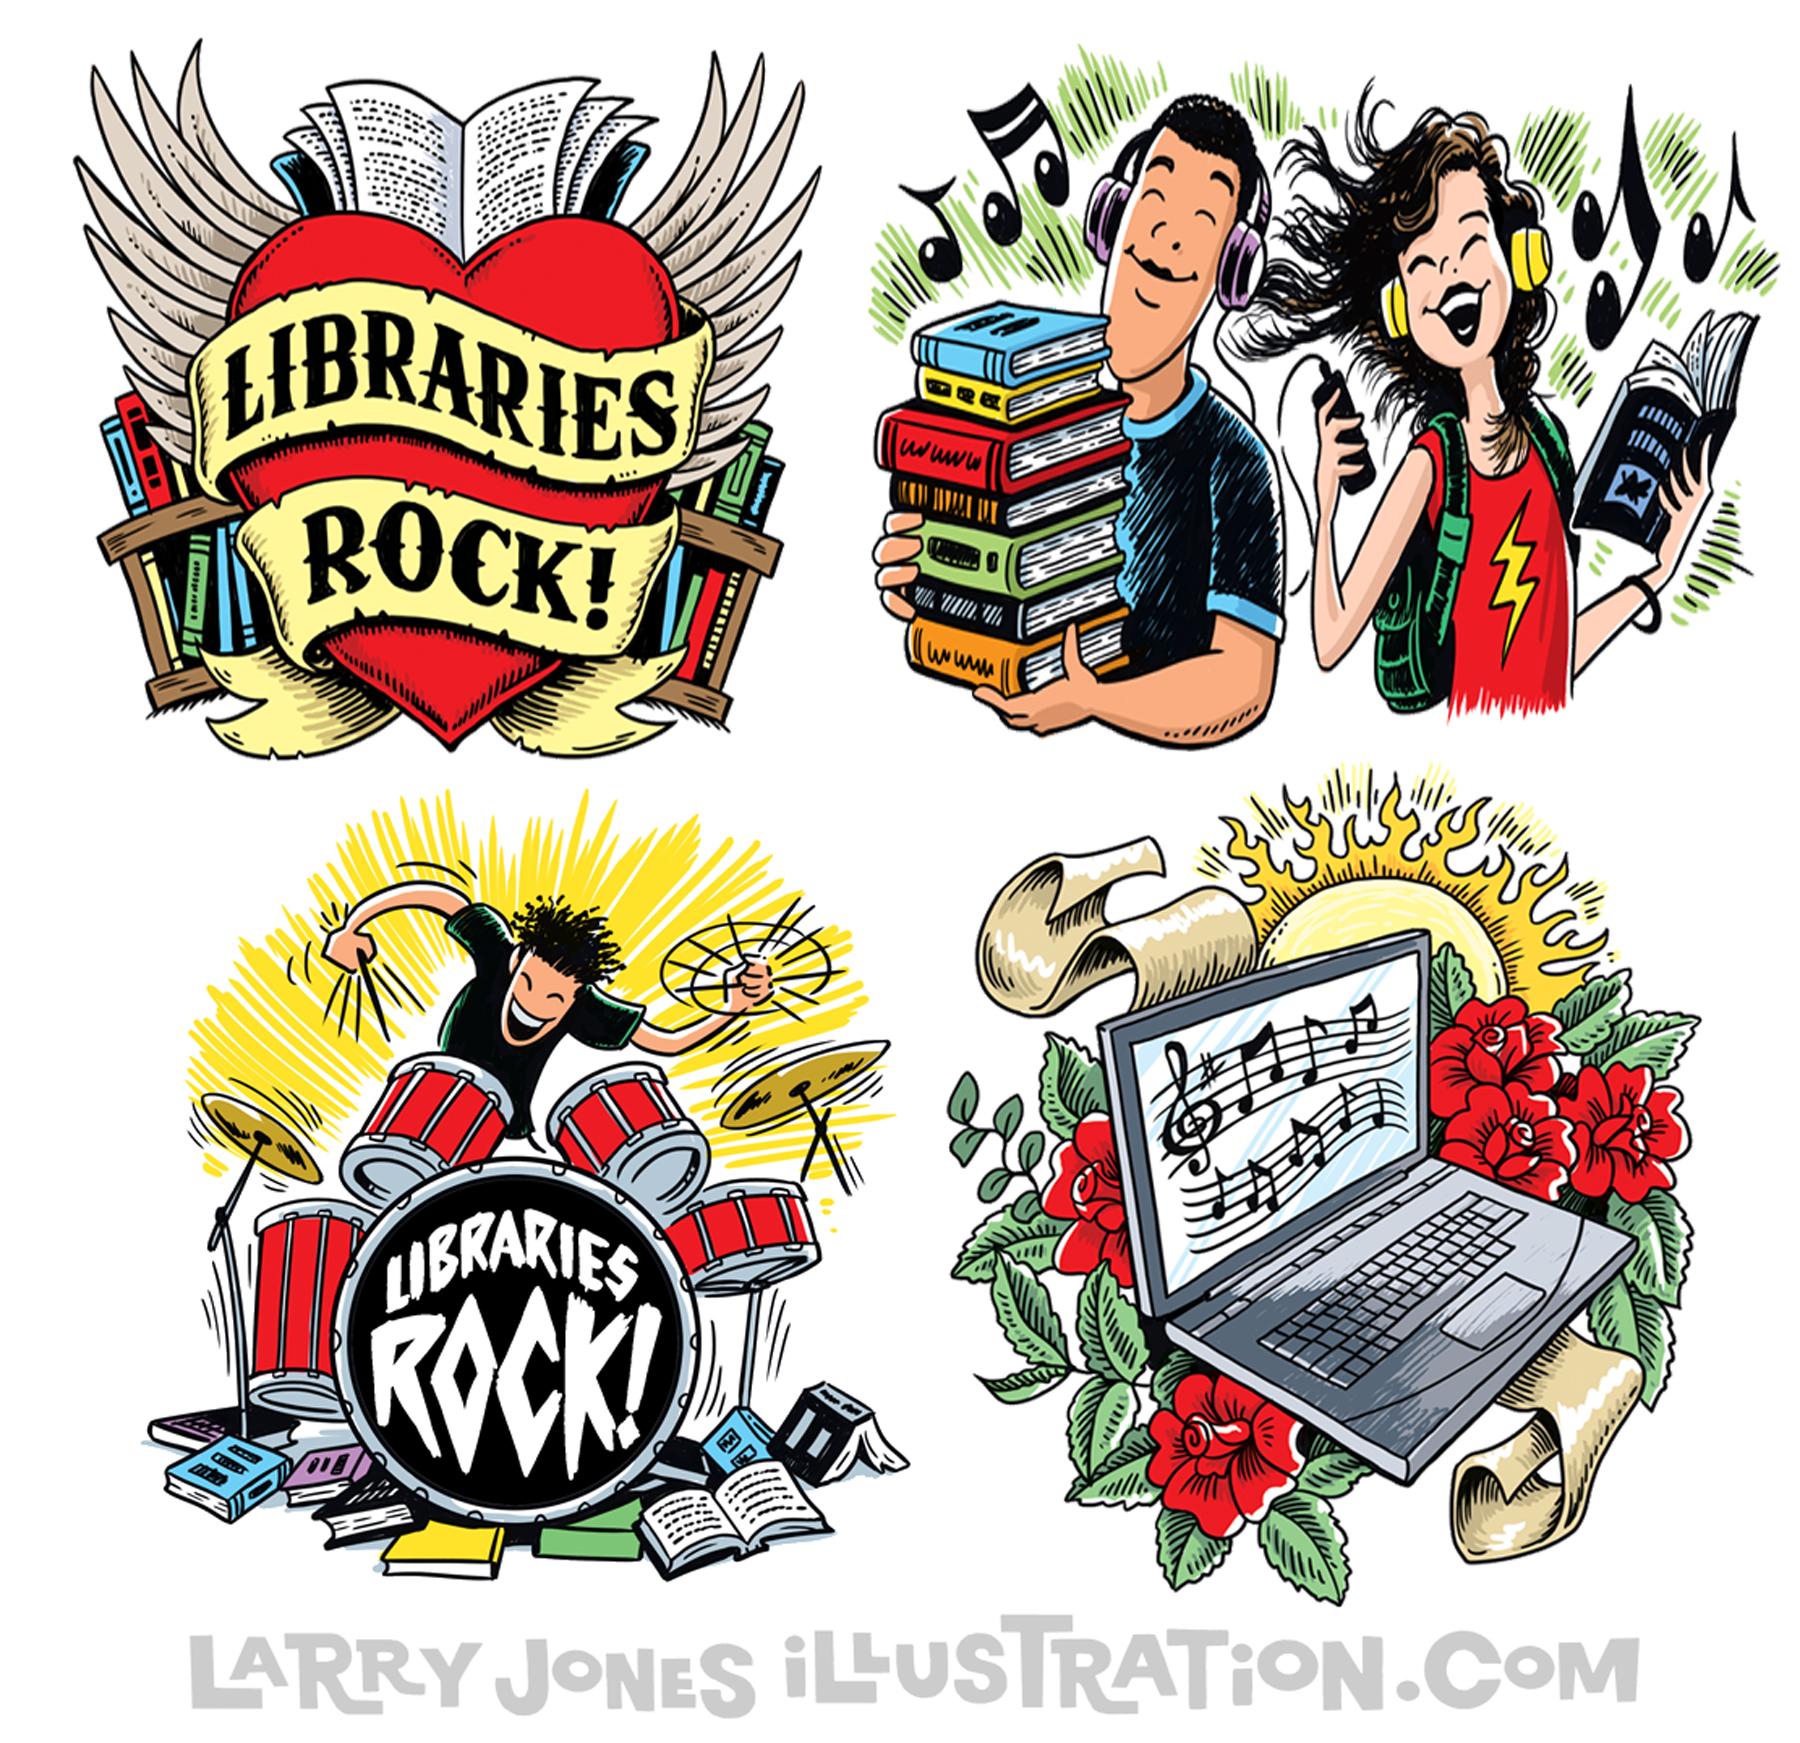 libraries-rock-spots.jpg